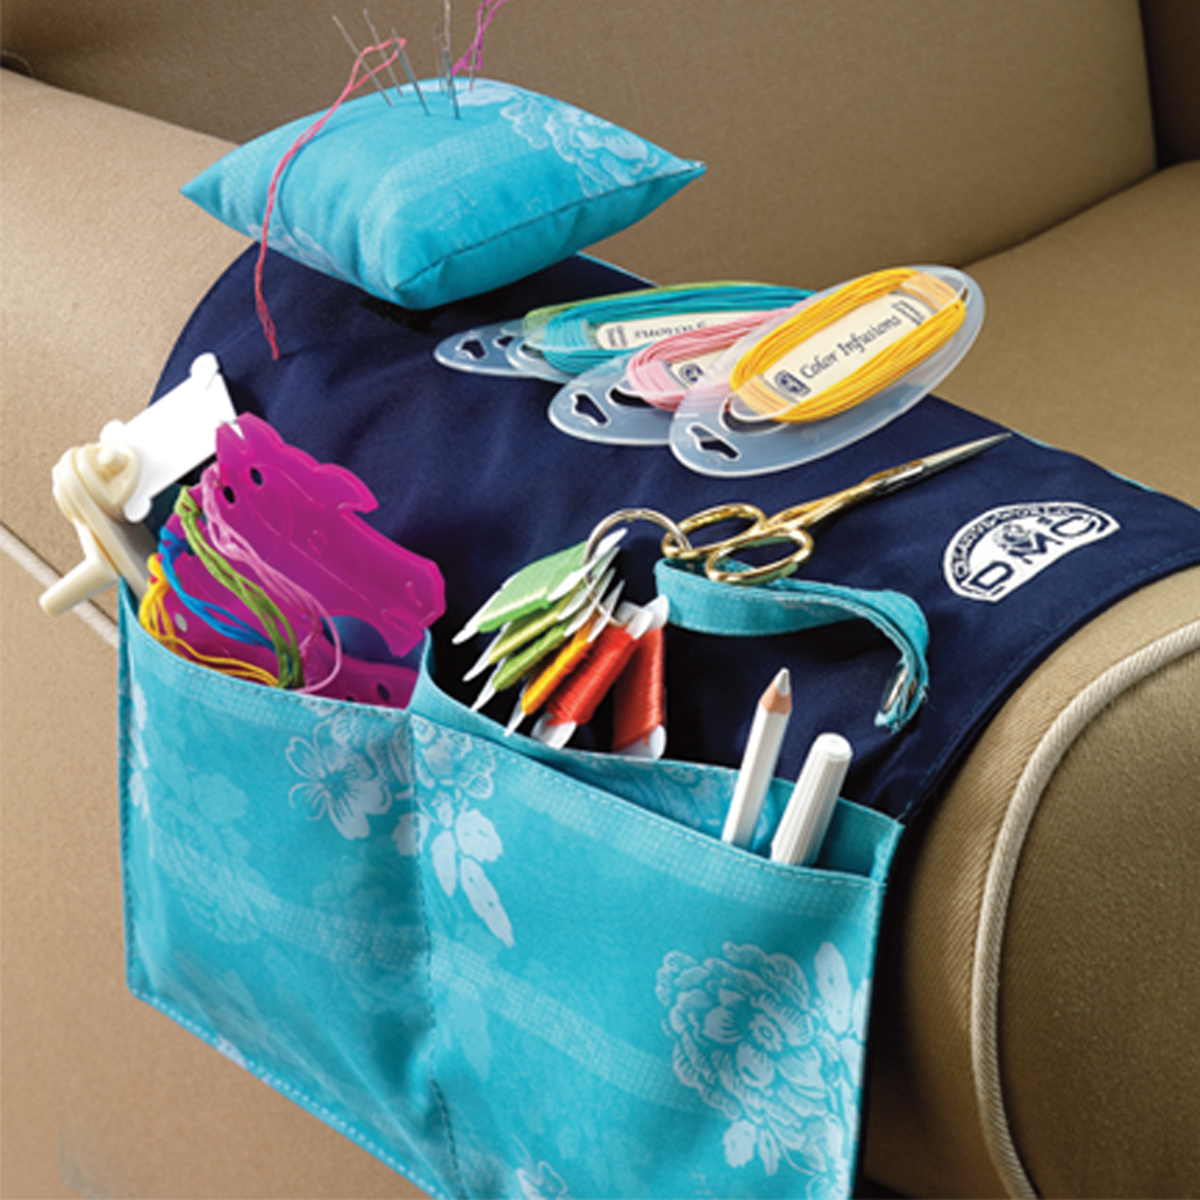 DMC Arm Chair Needlework Organizer- Multi-Colored